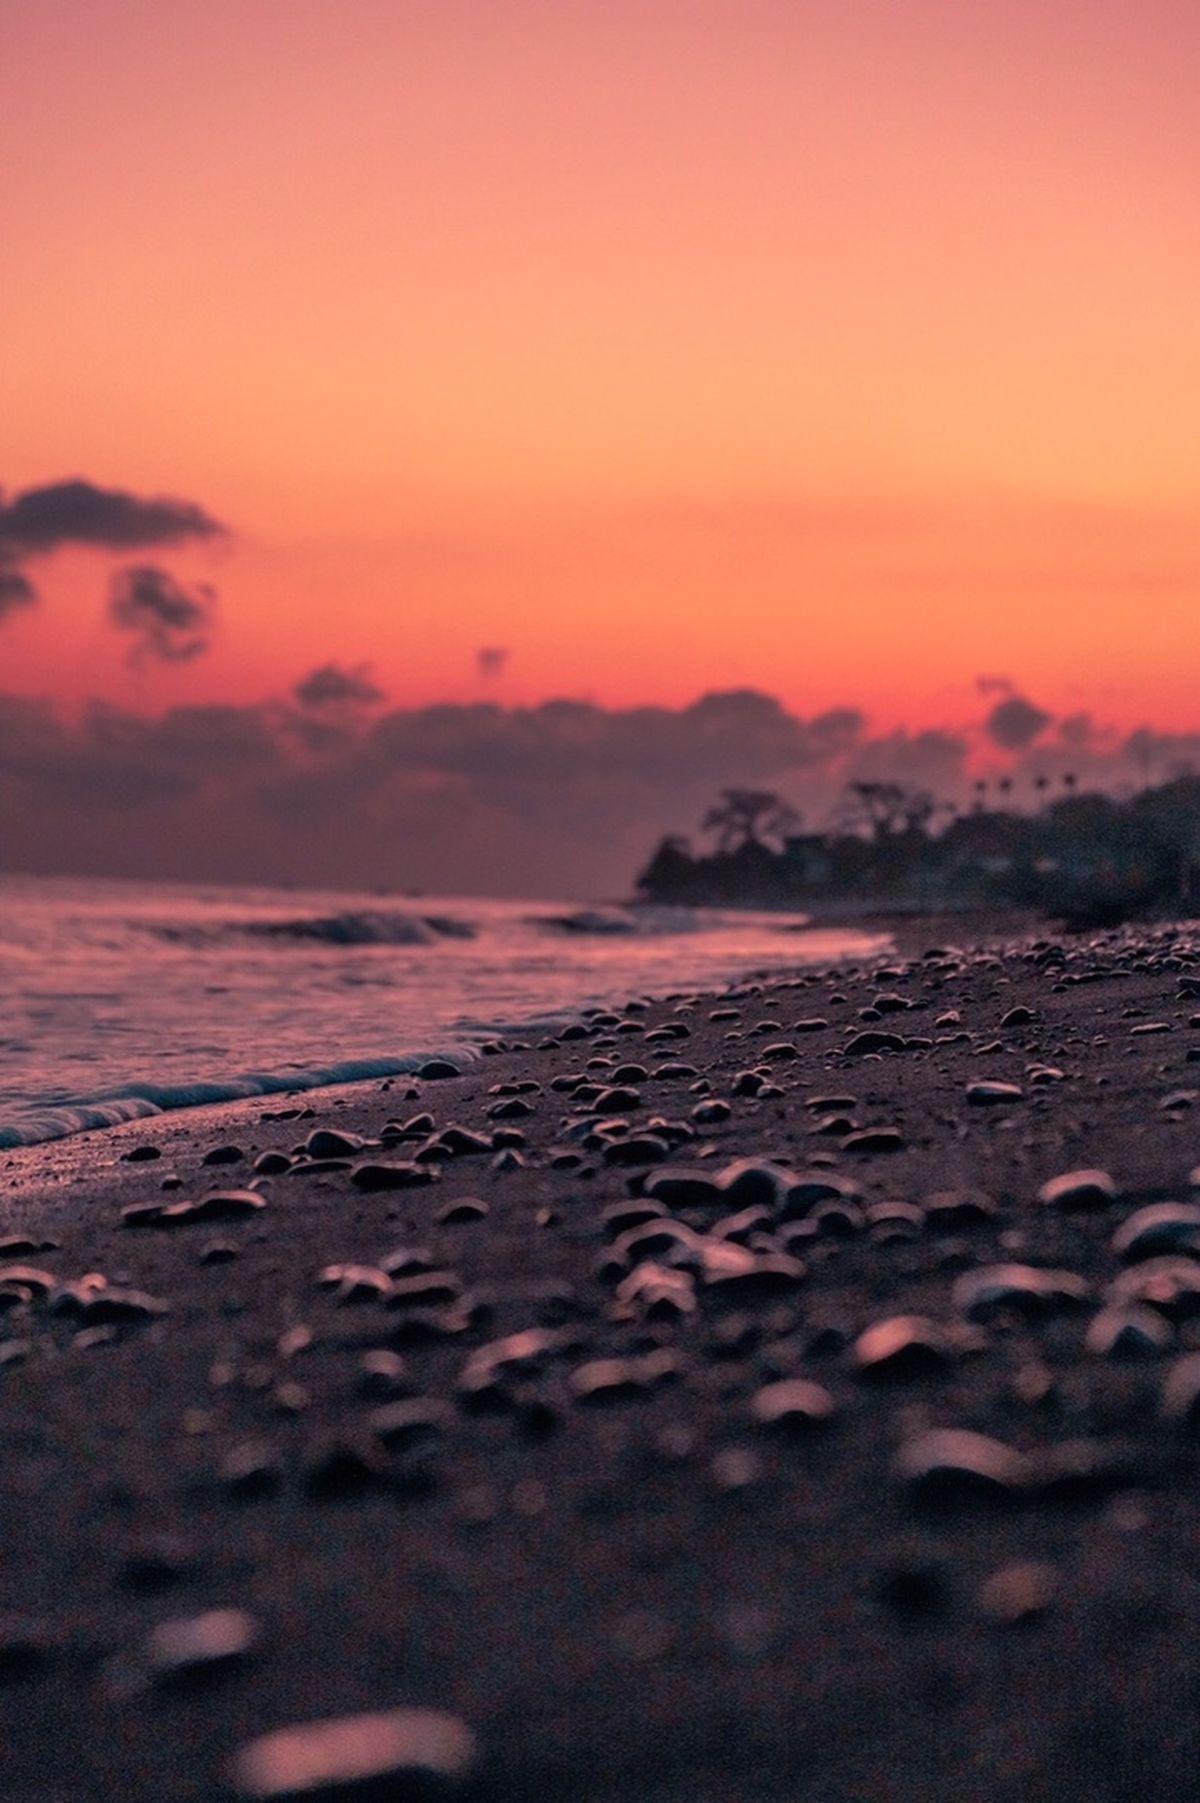 Пляж Black Sand Beach. Пляж на востоке Бали, Паданг Бай. Фото: архив Максима БУЛАША